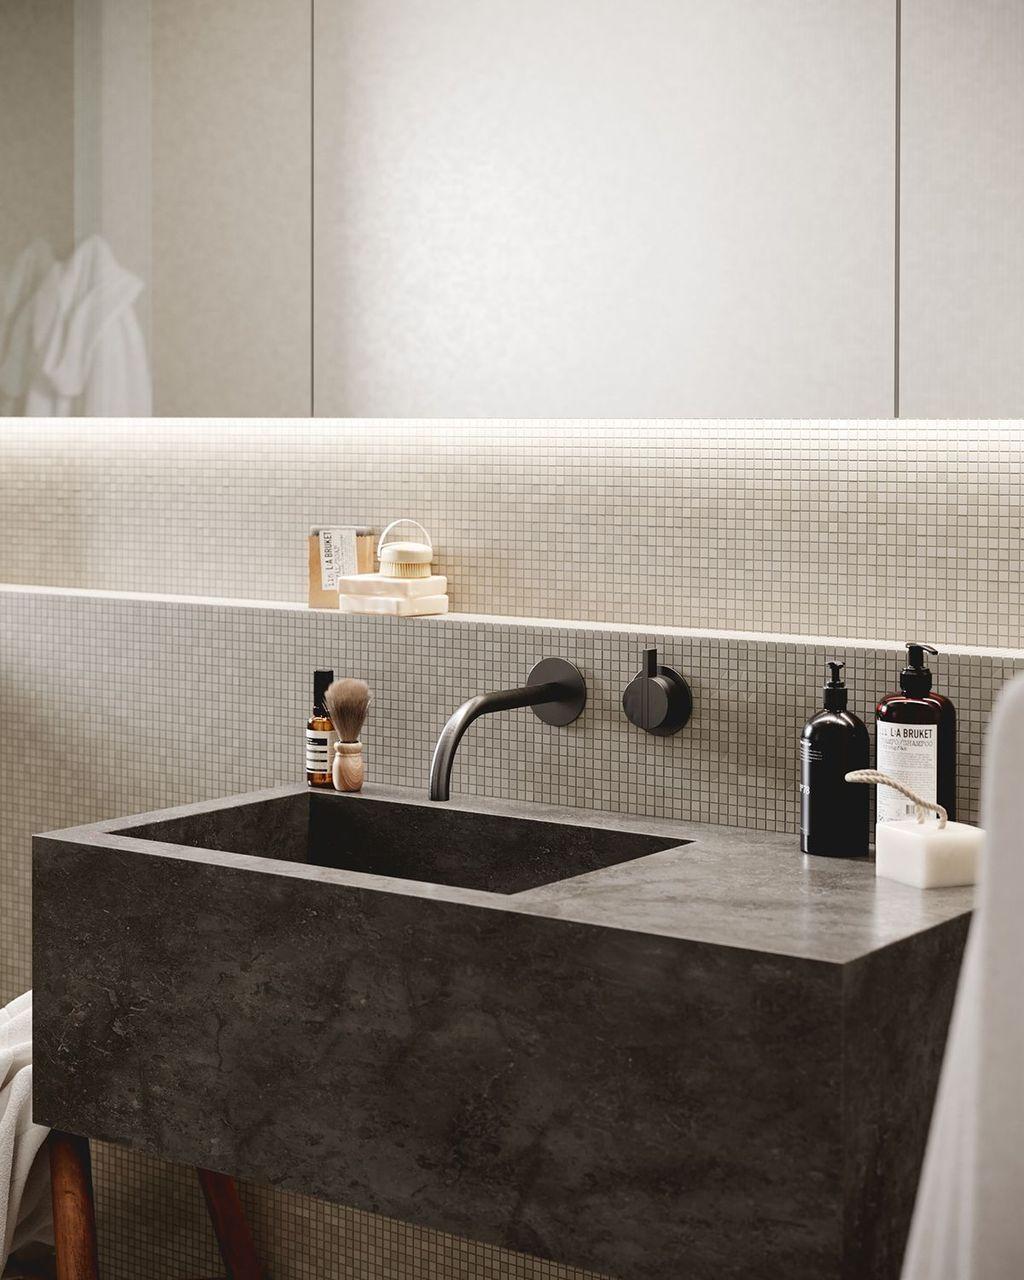 34 Inexpensive Bathroom Design Ideas With Lights